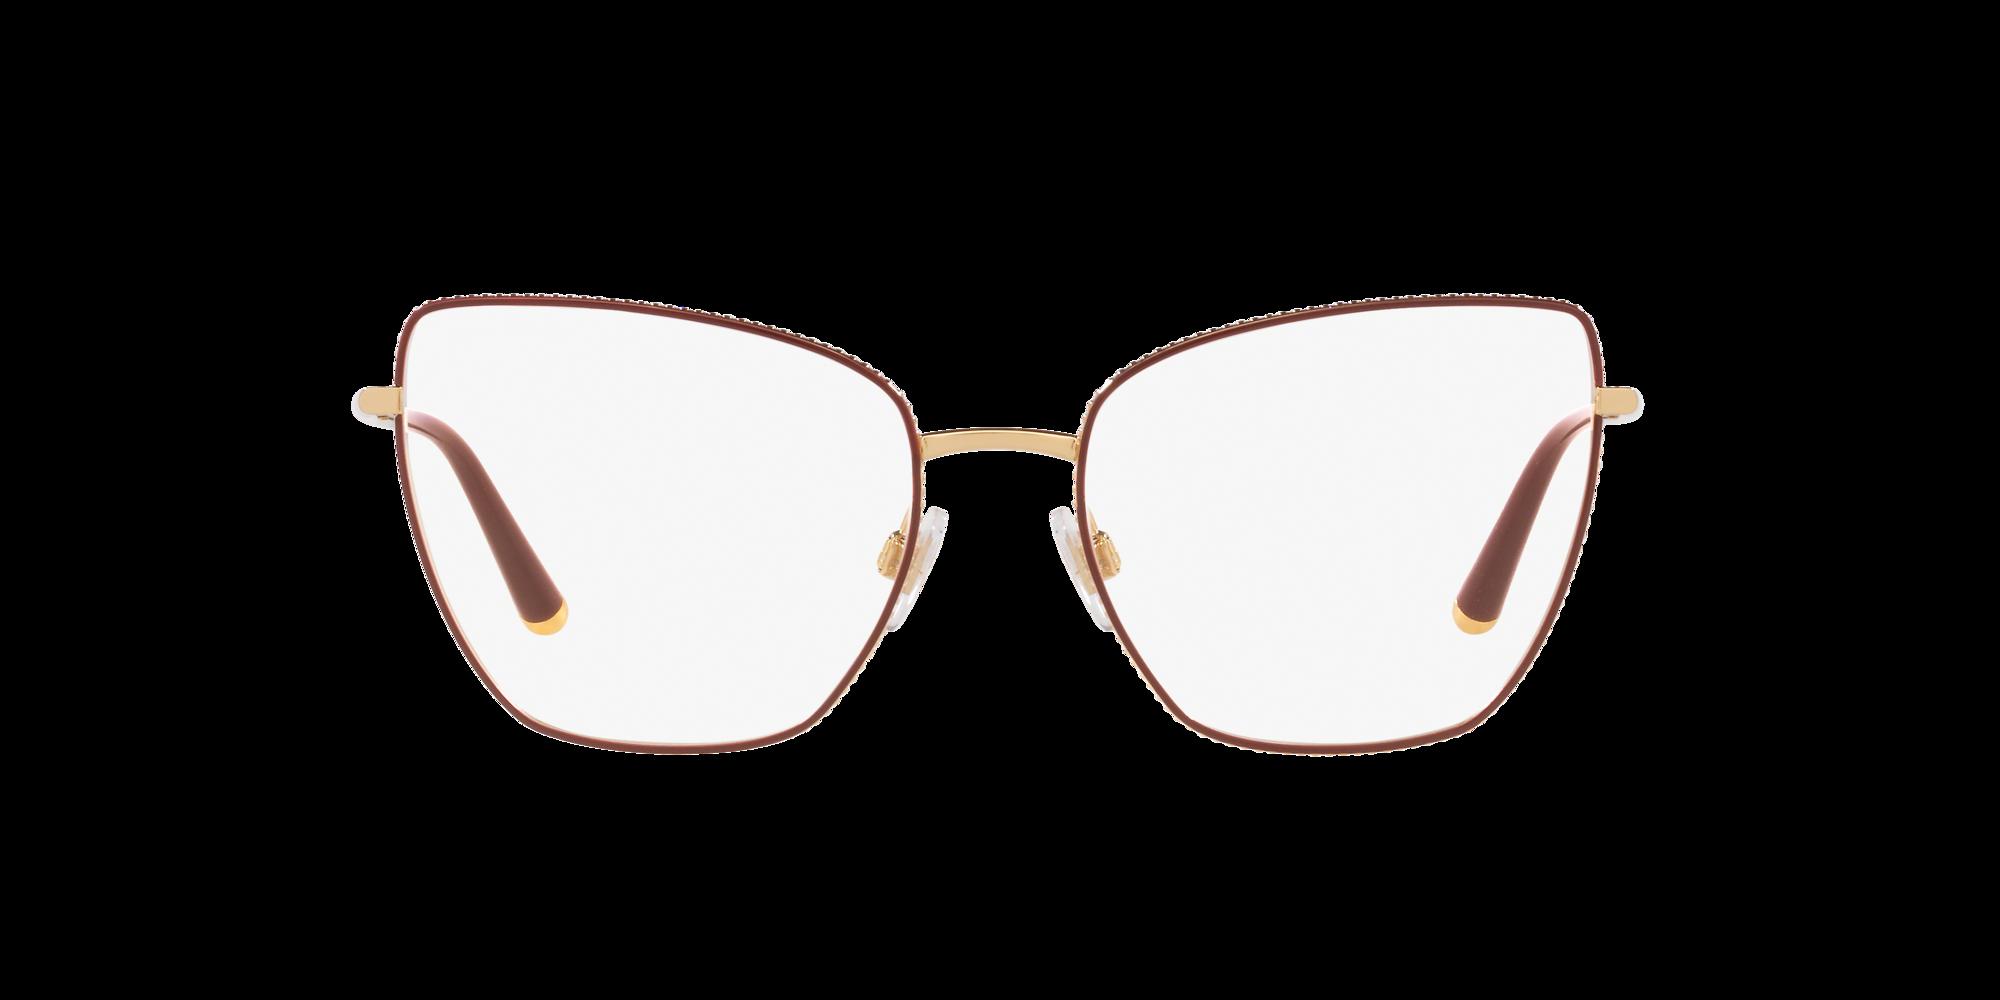 Image for DG1314 from LensCrafters | Glasses, Prescription Glasses Online, Eyewear